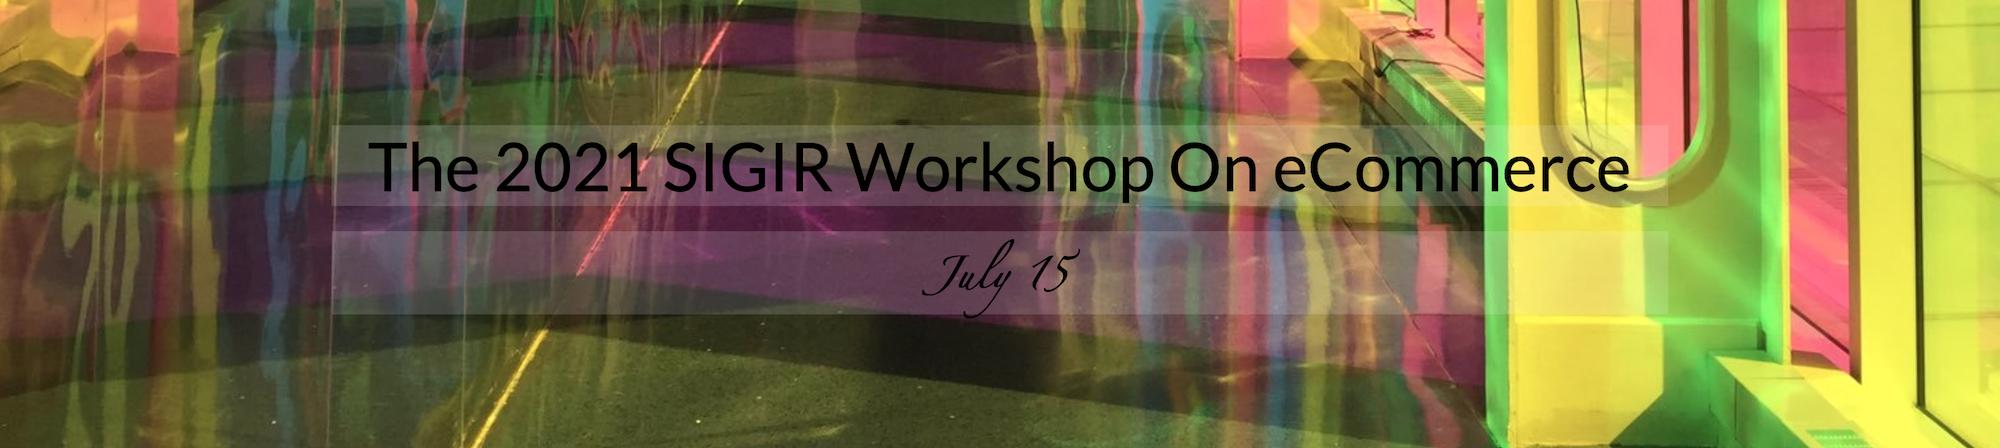 2021 SIGIR Workshop on eCommerce